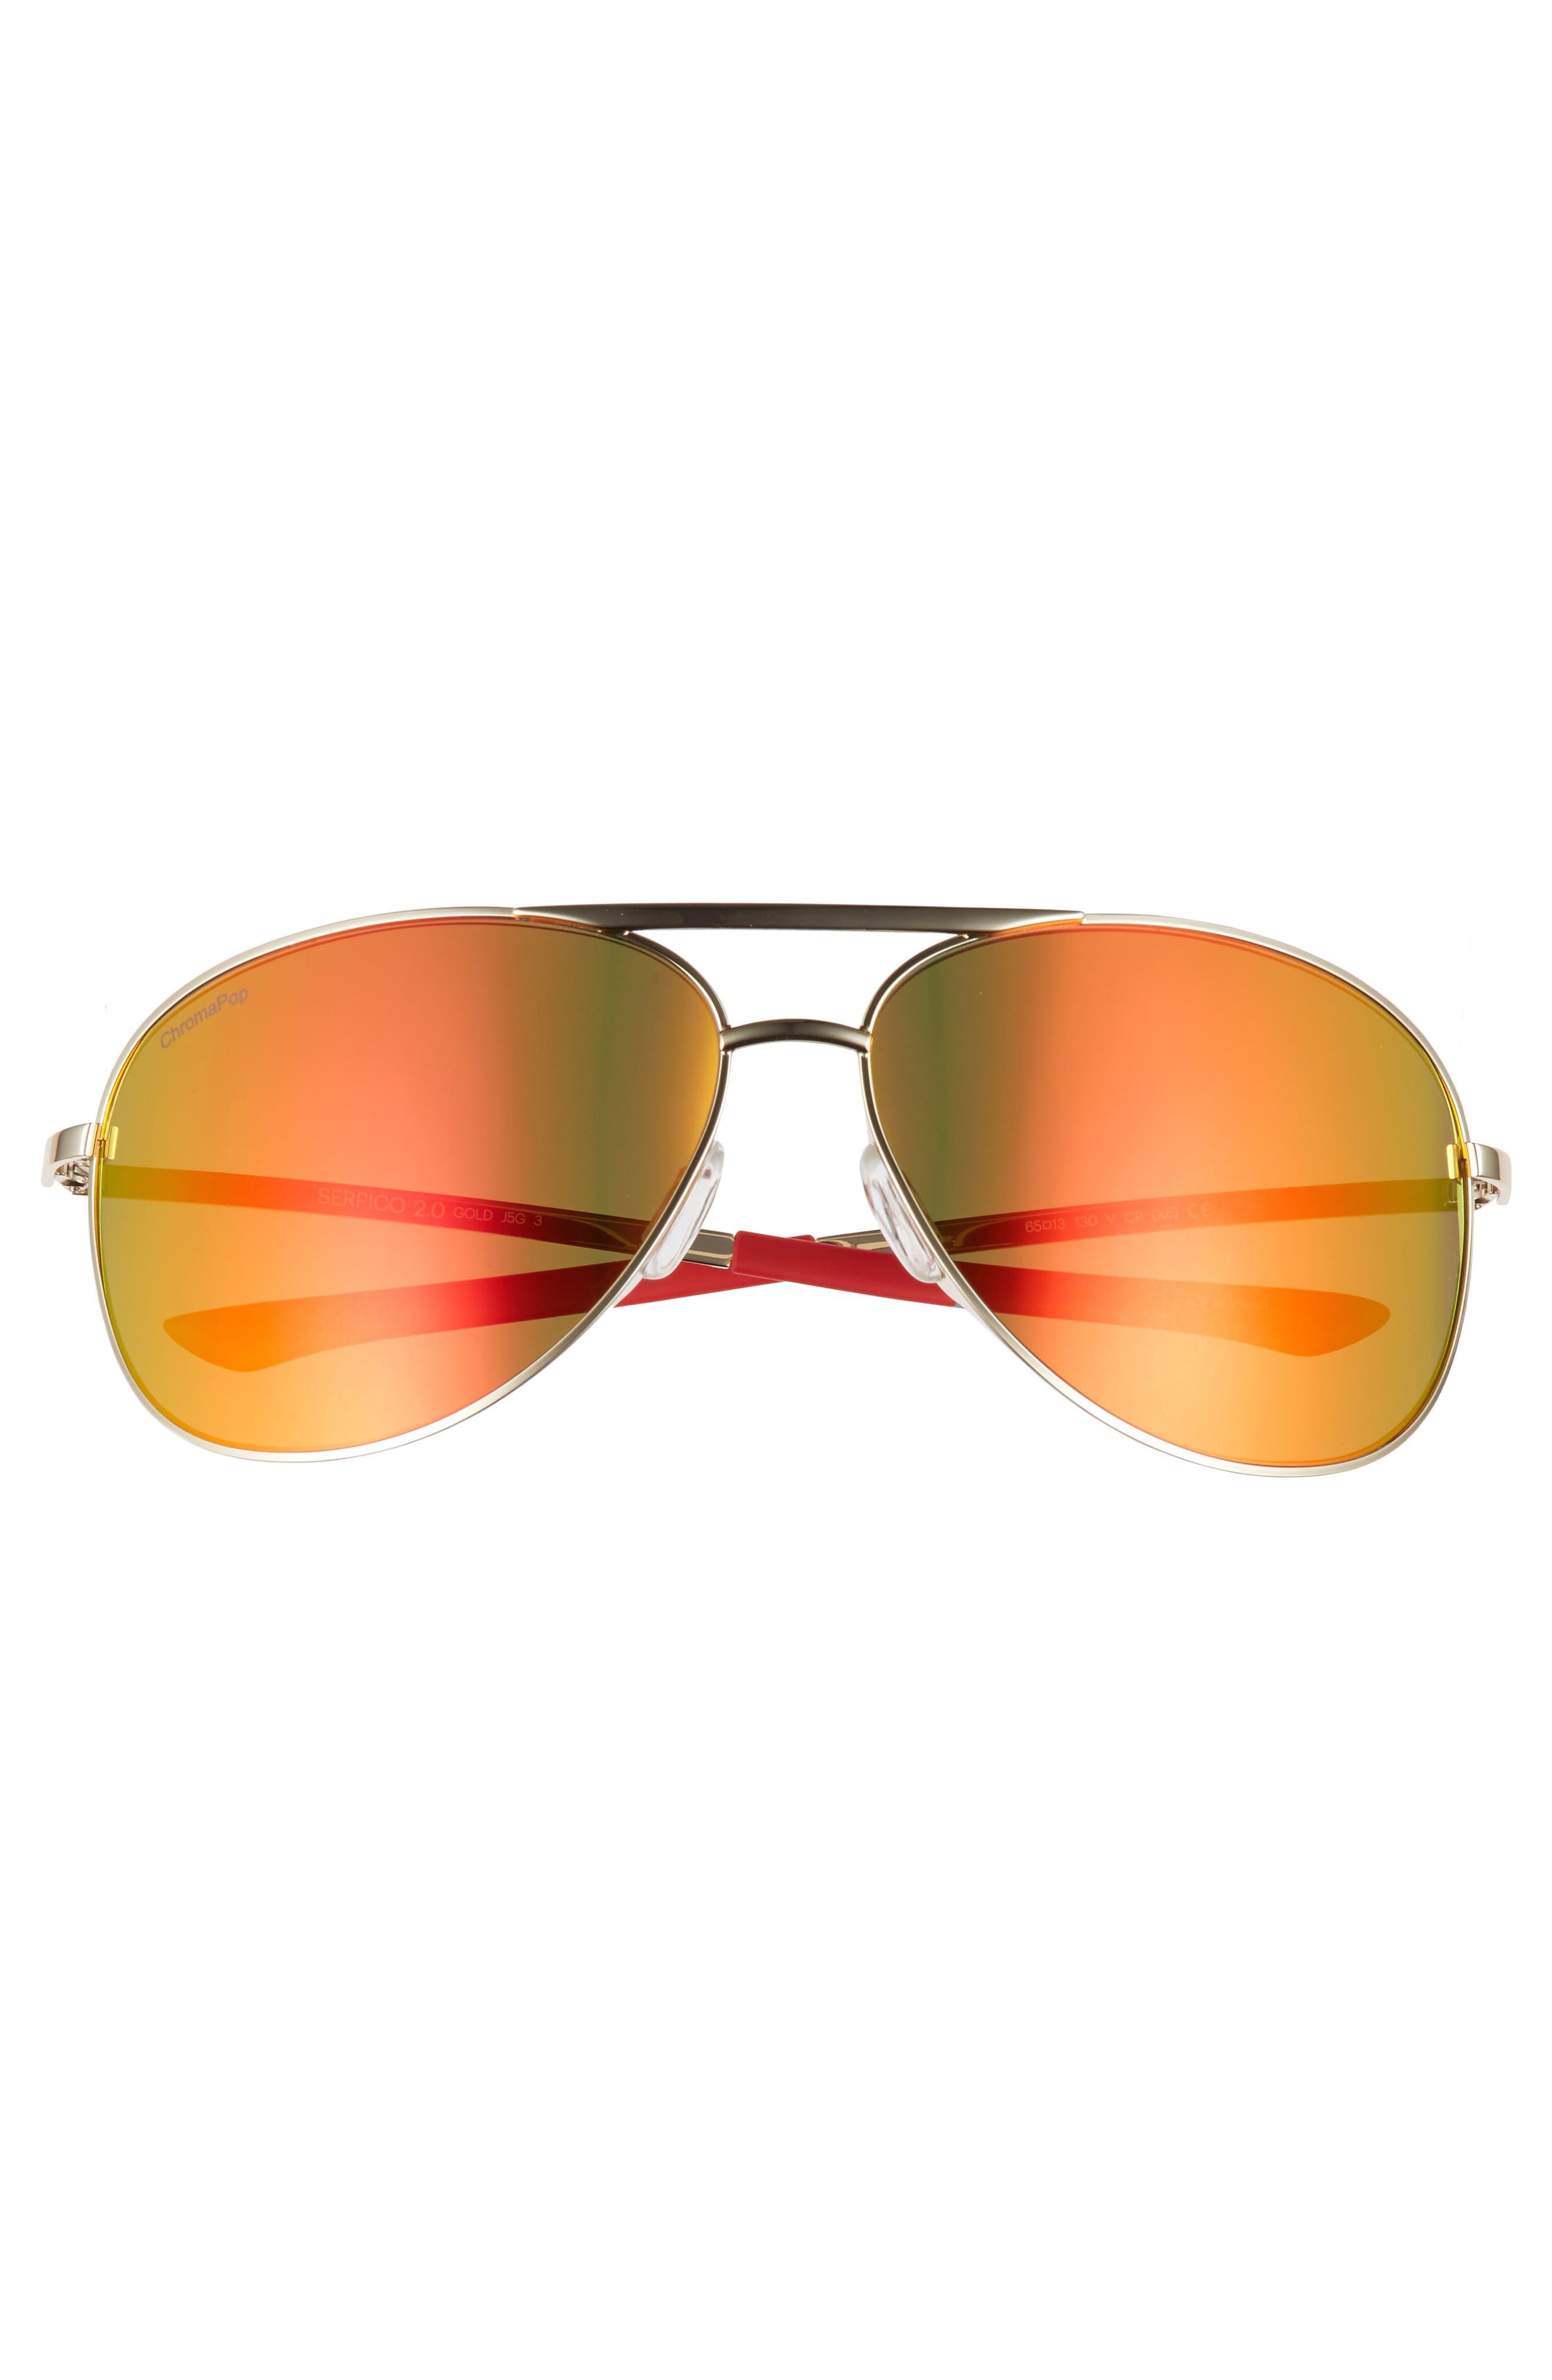 Serpico 2 65mm Mirrored ChromaPop<sup>™</sup> Polarized Aviator Sunglasses,                             Alternate thumbnail 3, color,                             710